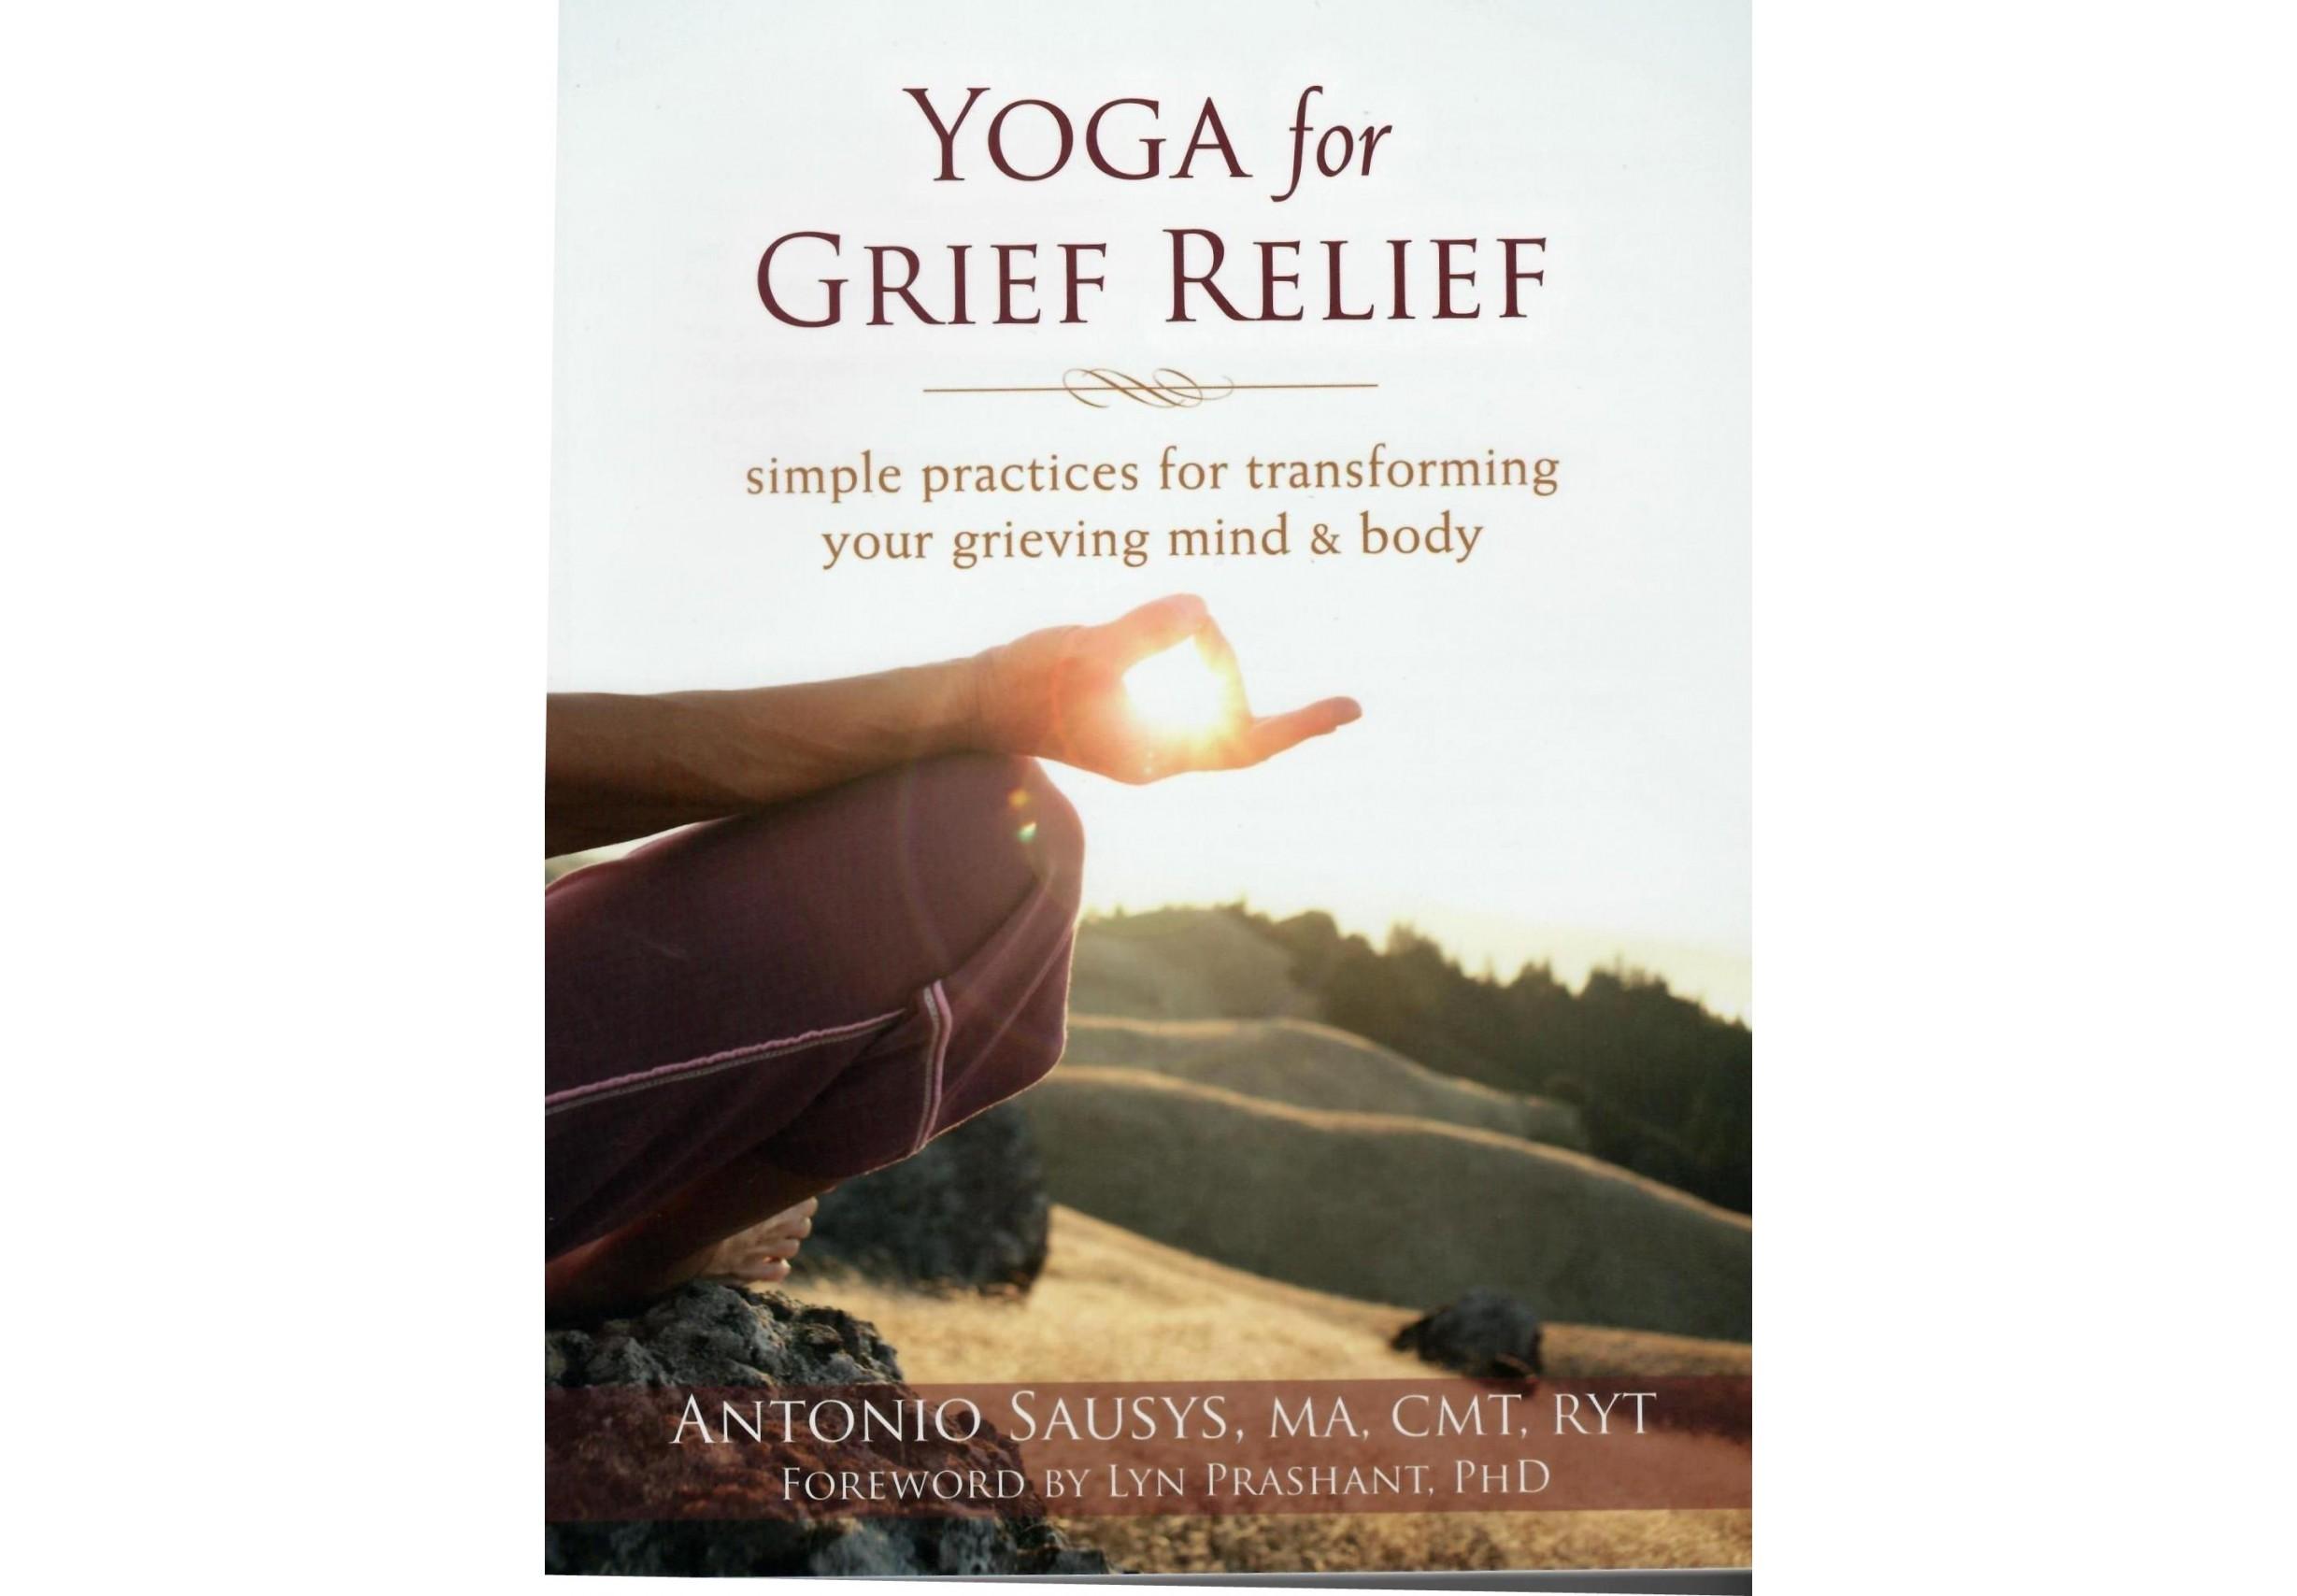 Yoga for Grief Relief- Antonio Sausys